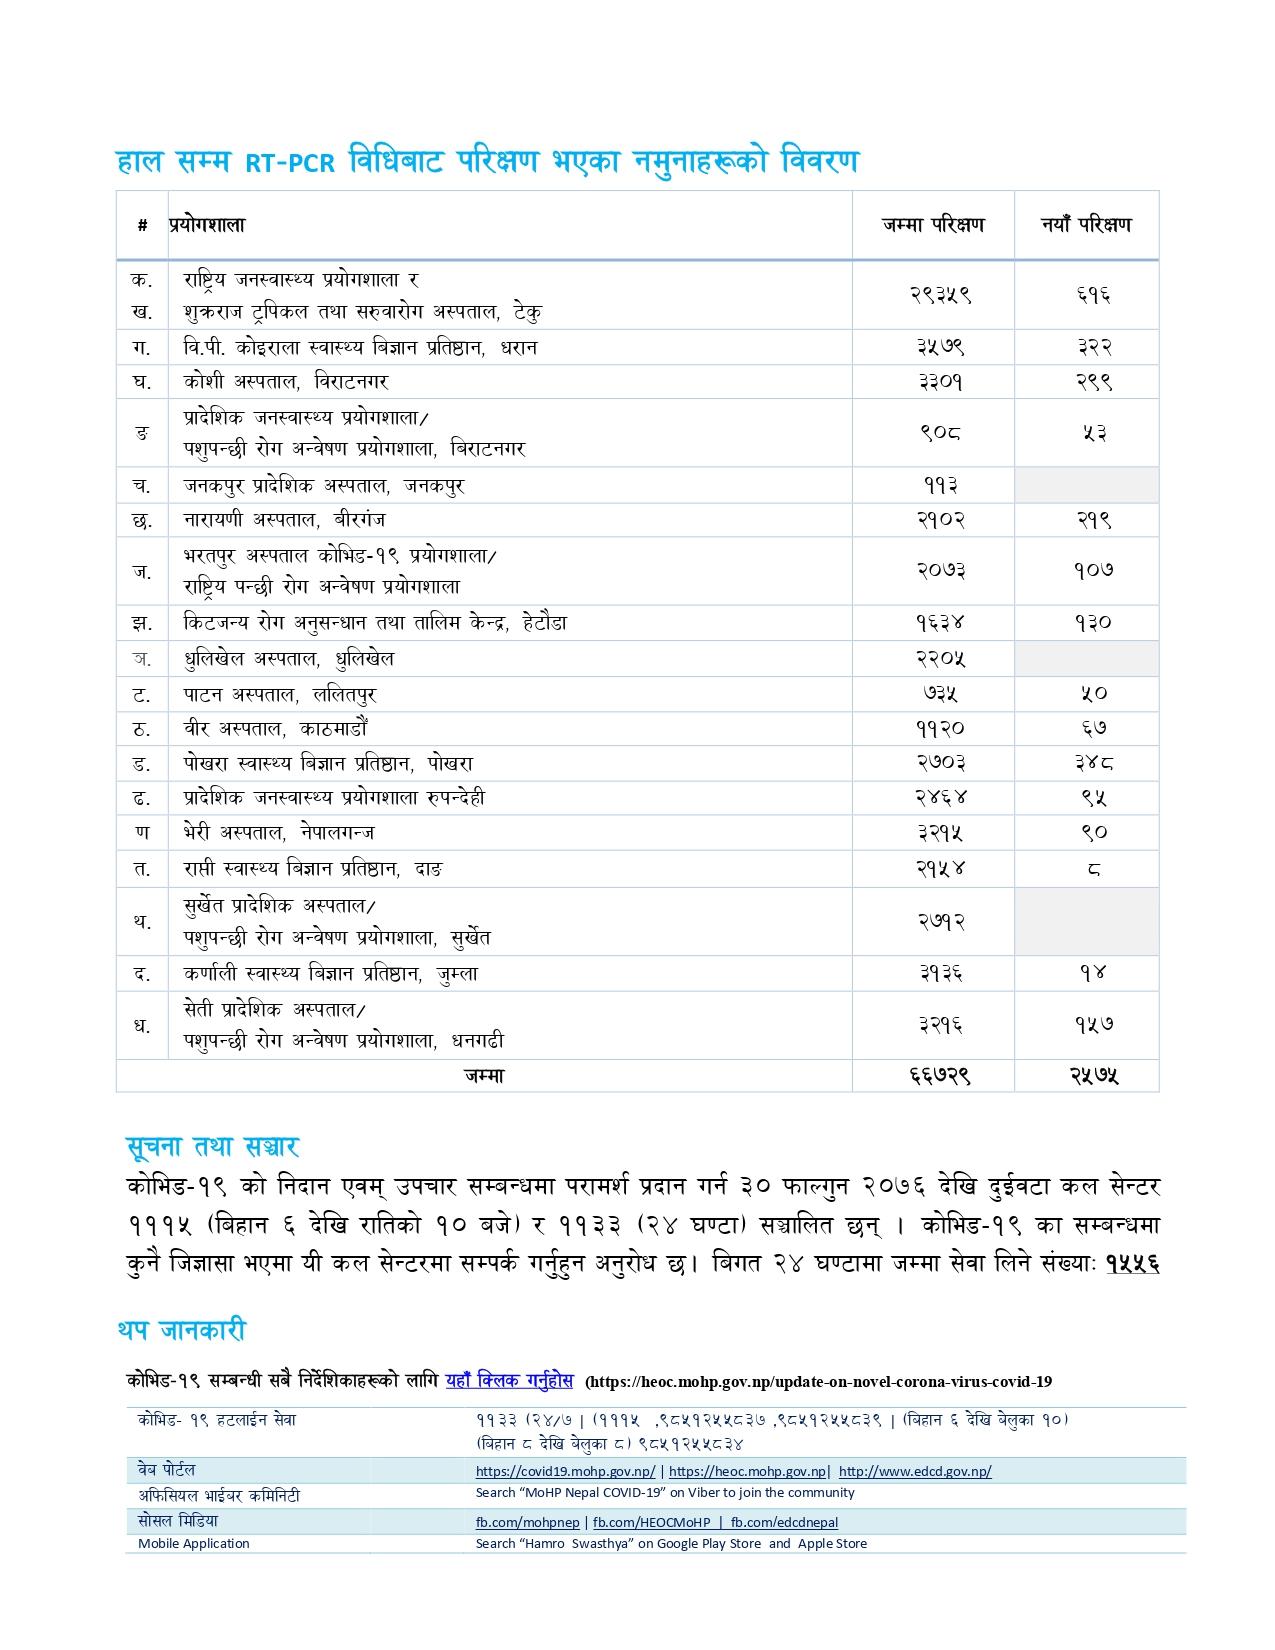 Nepal Lab-wise Testing